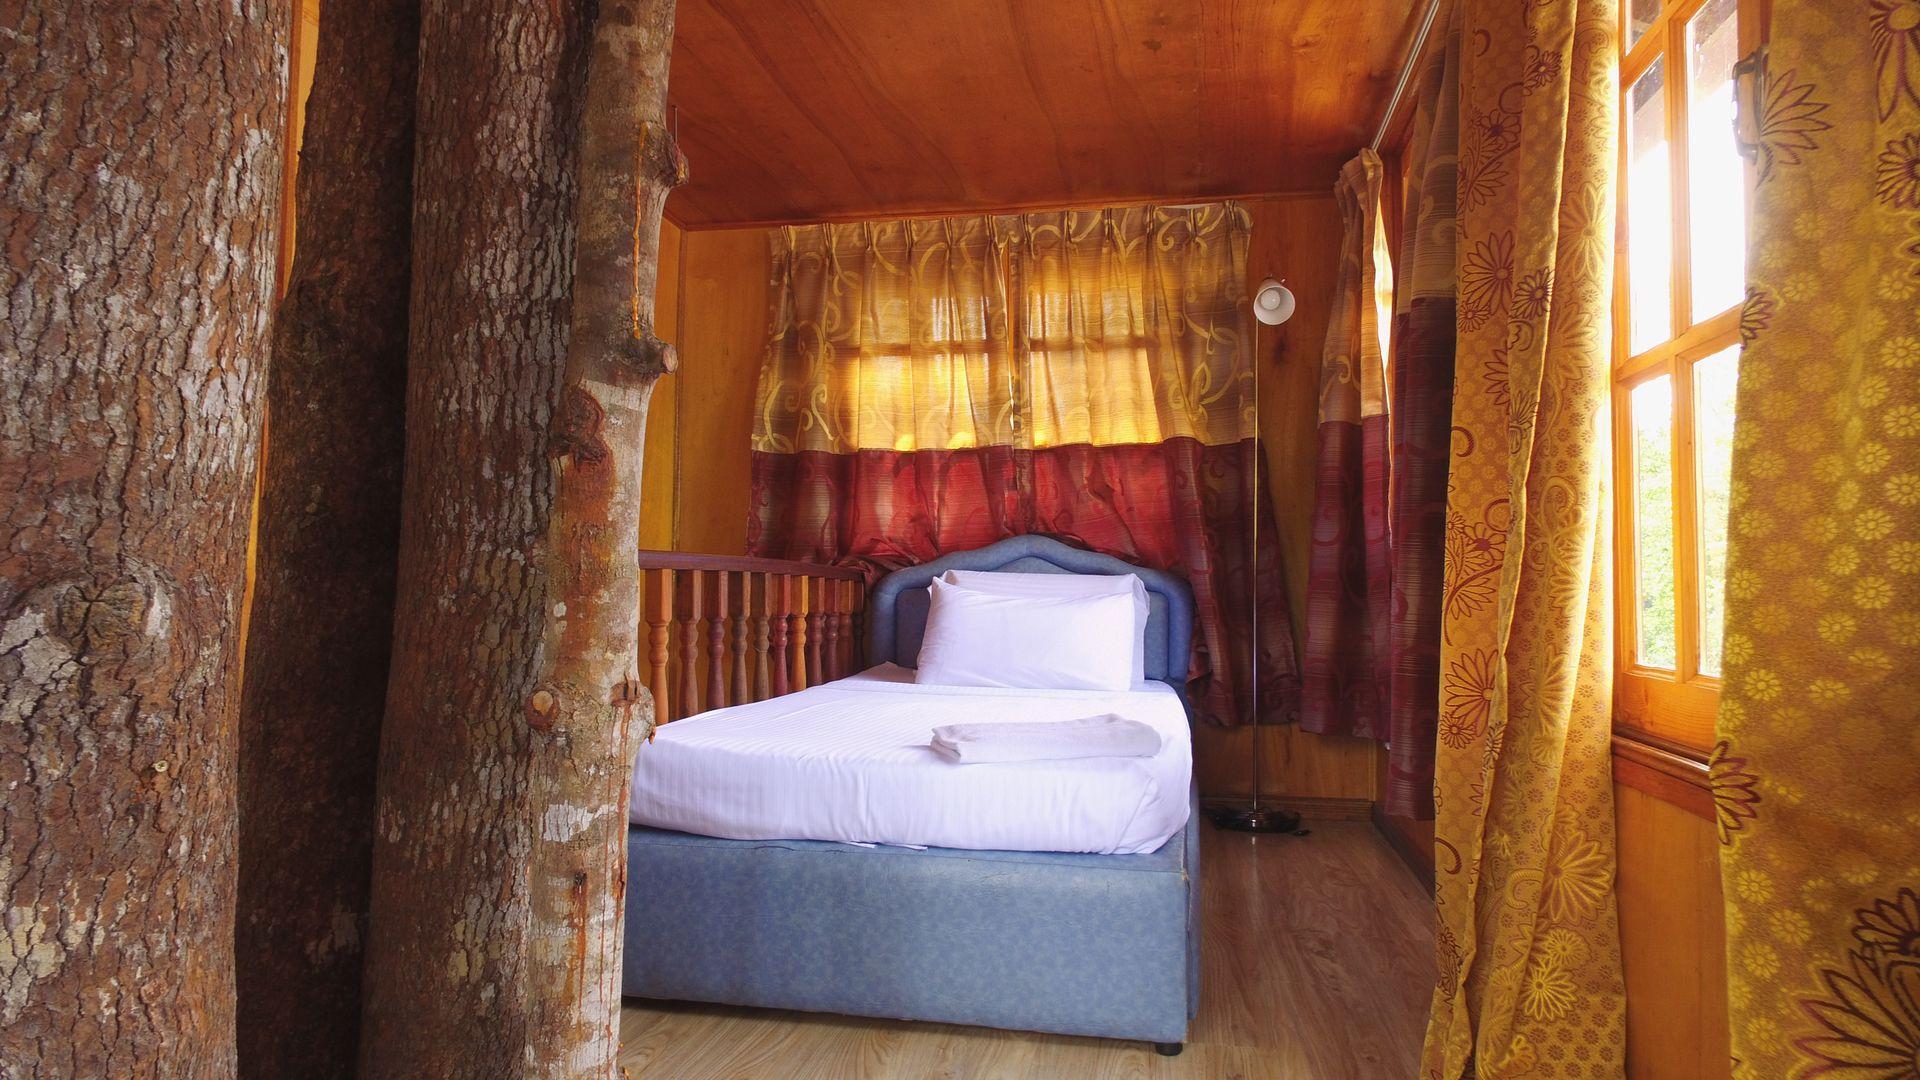 Borneo Tree House Resort Kota Kinabalu Deals Photos Reviews